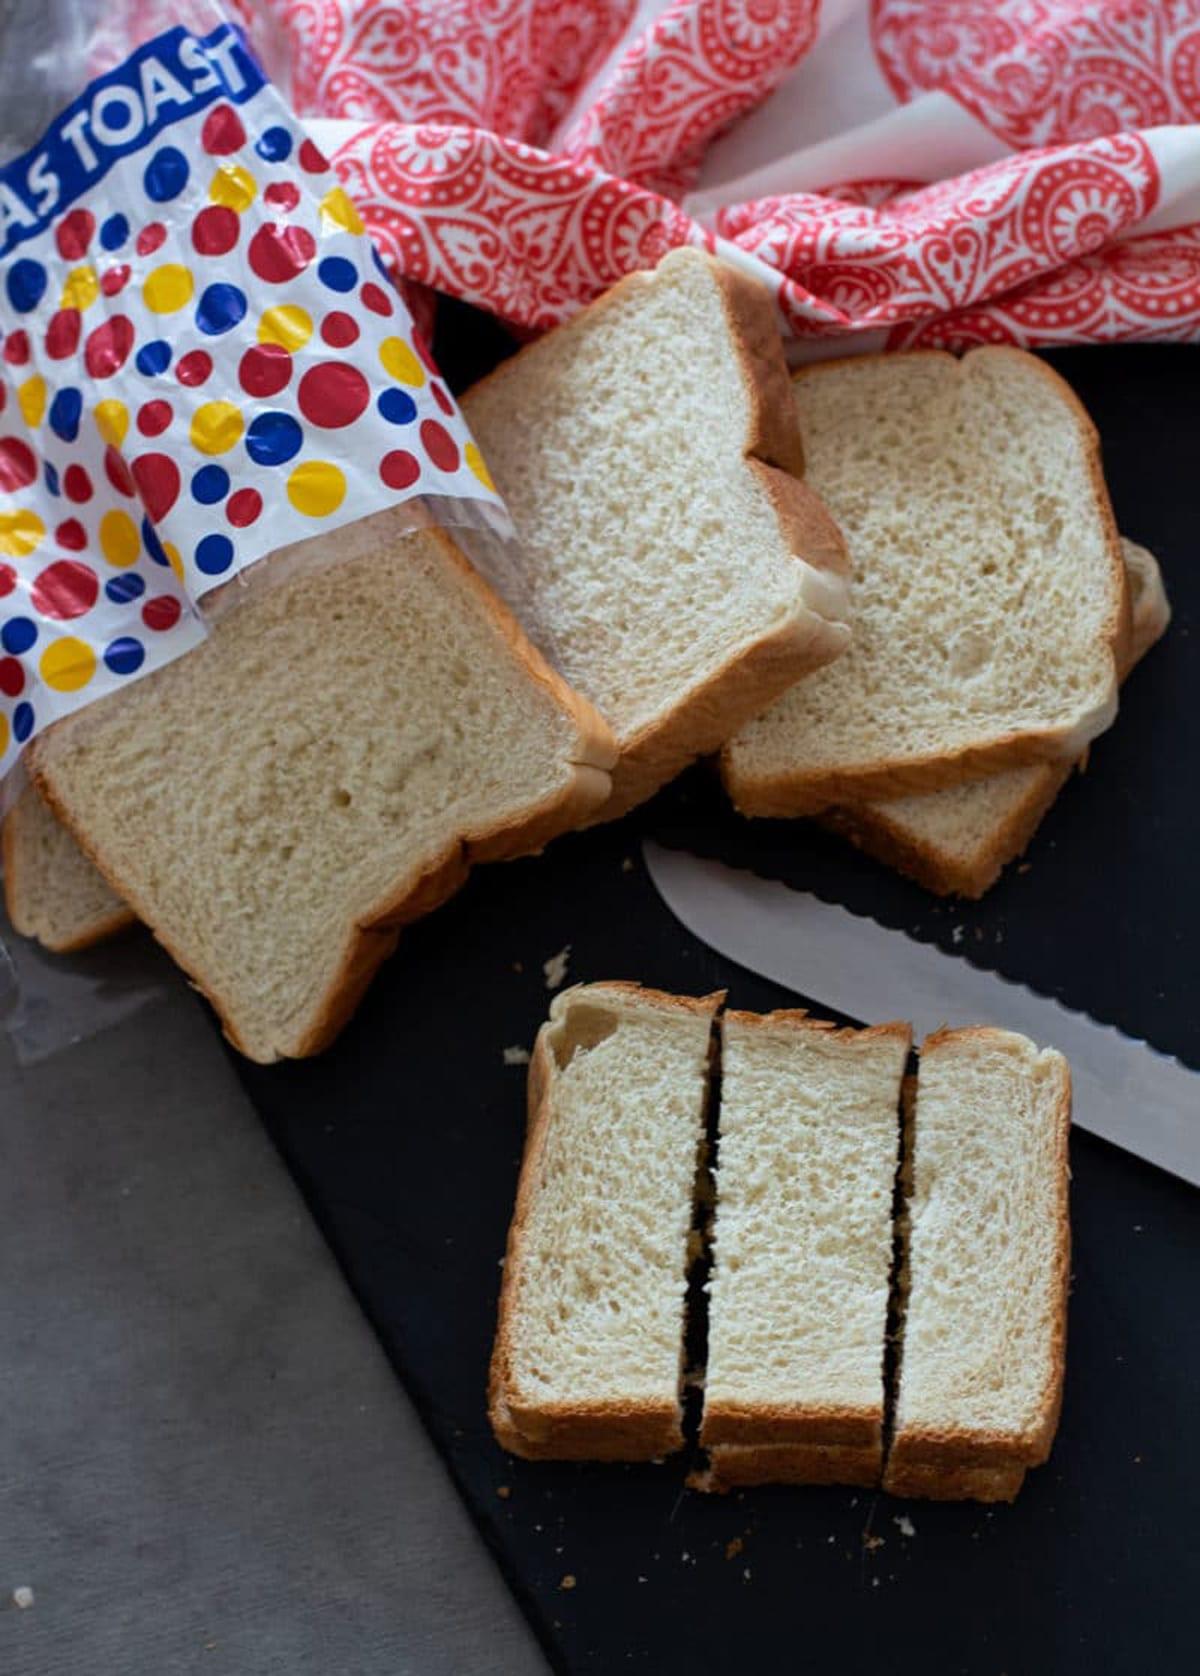 Texas Toast sliced to make French Toast sticks.